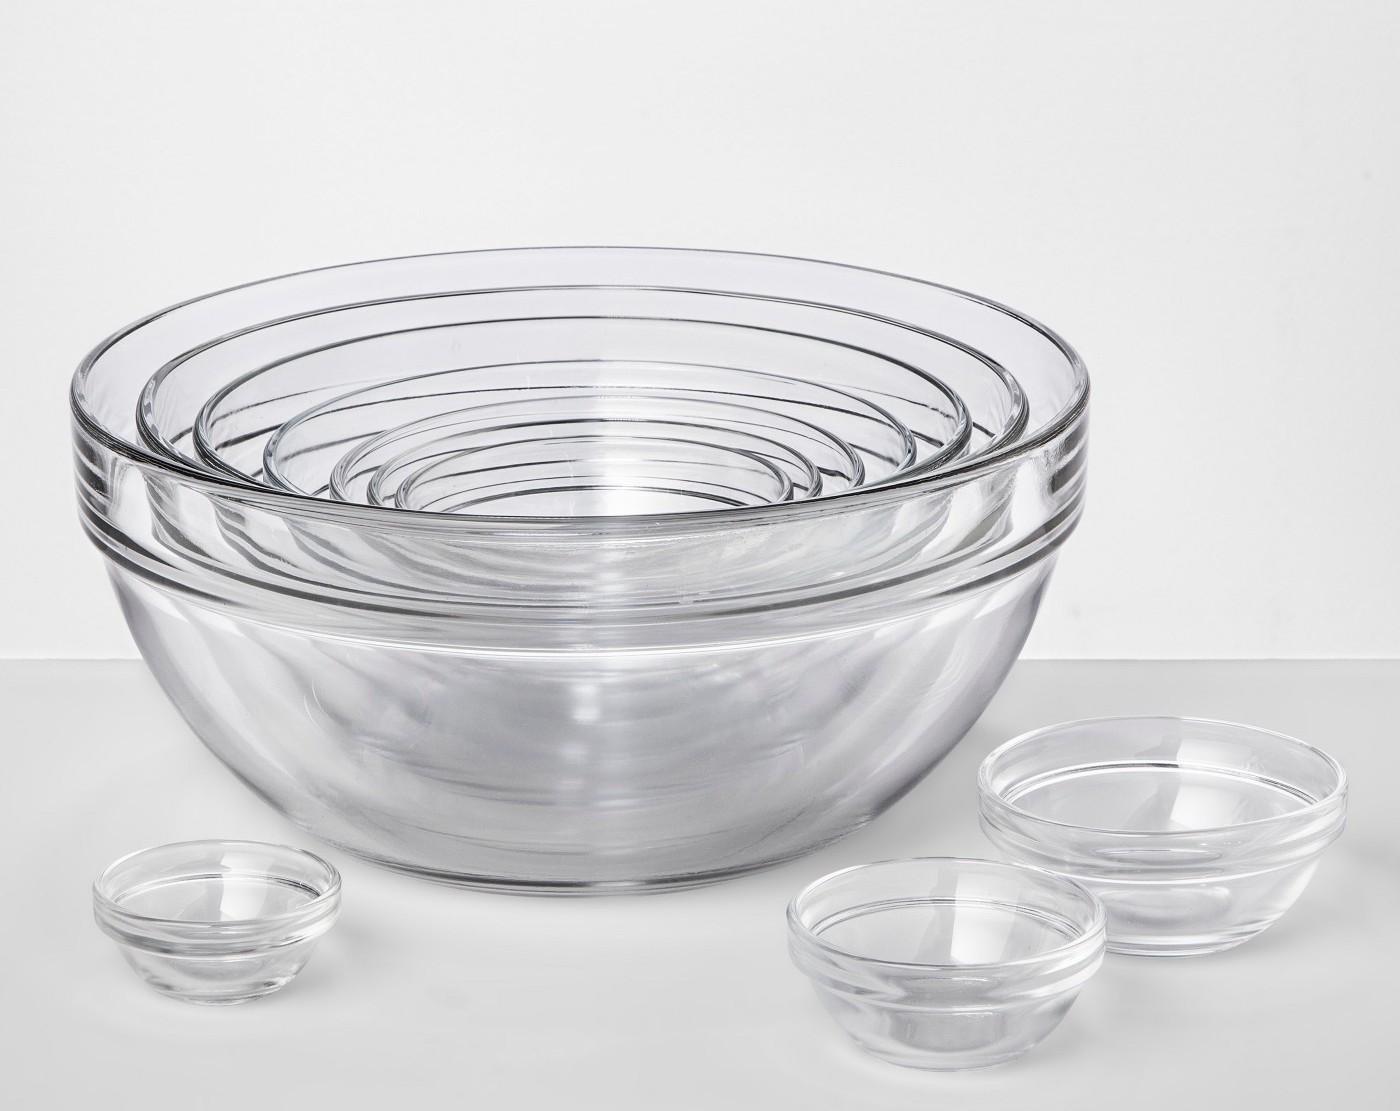 glass mixing bowls